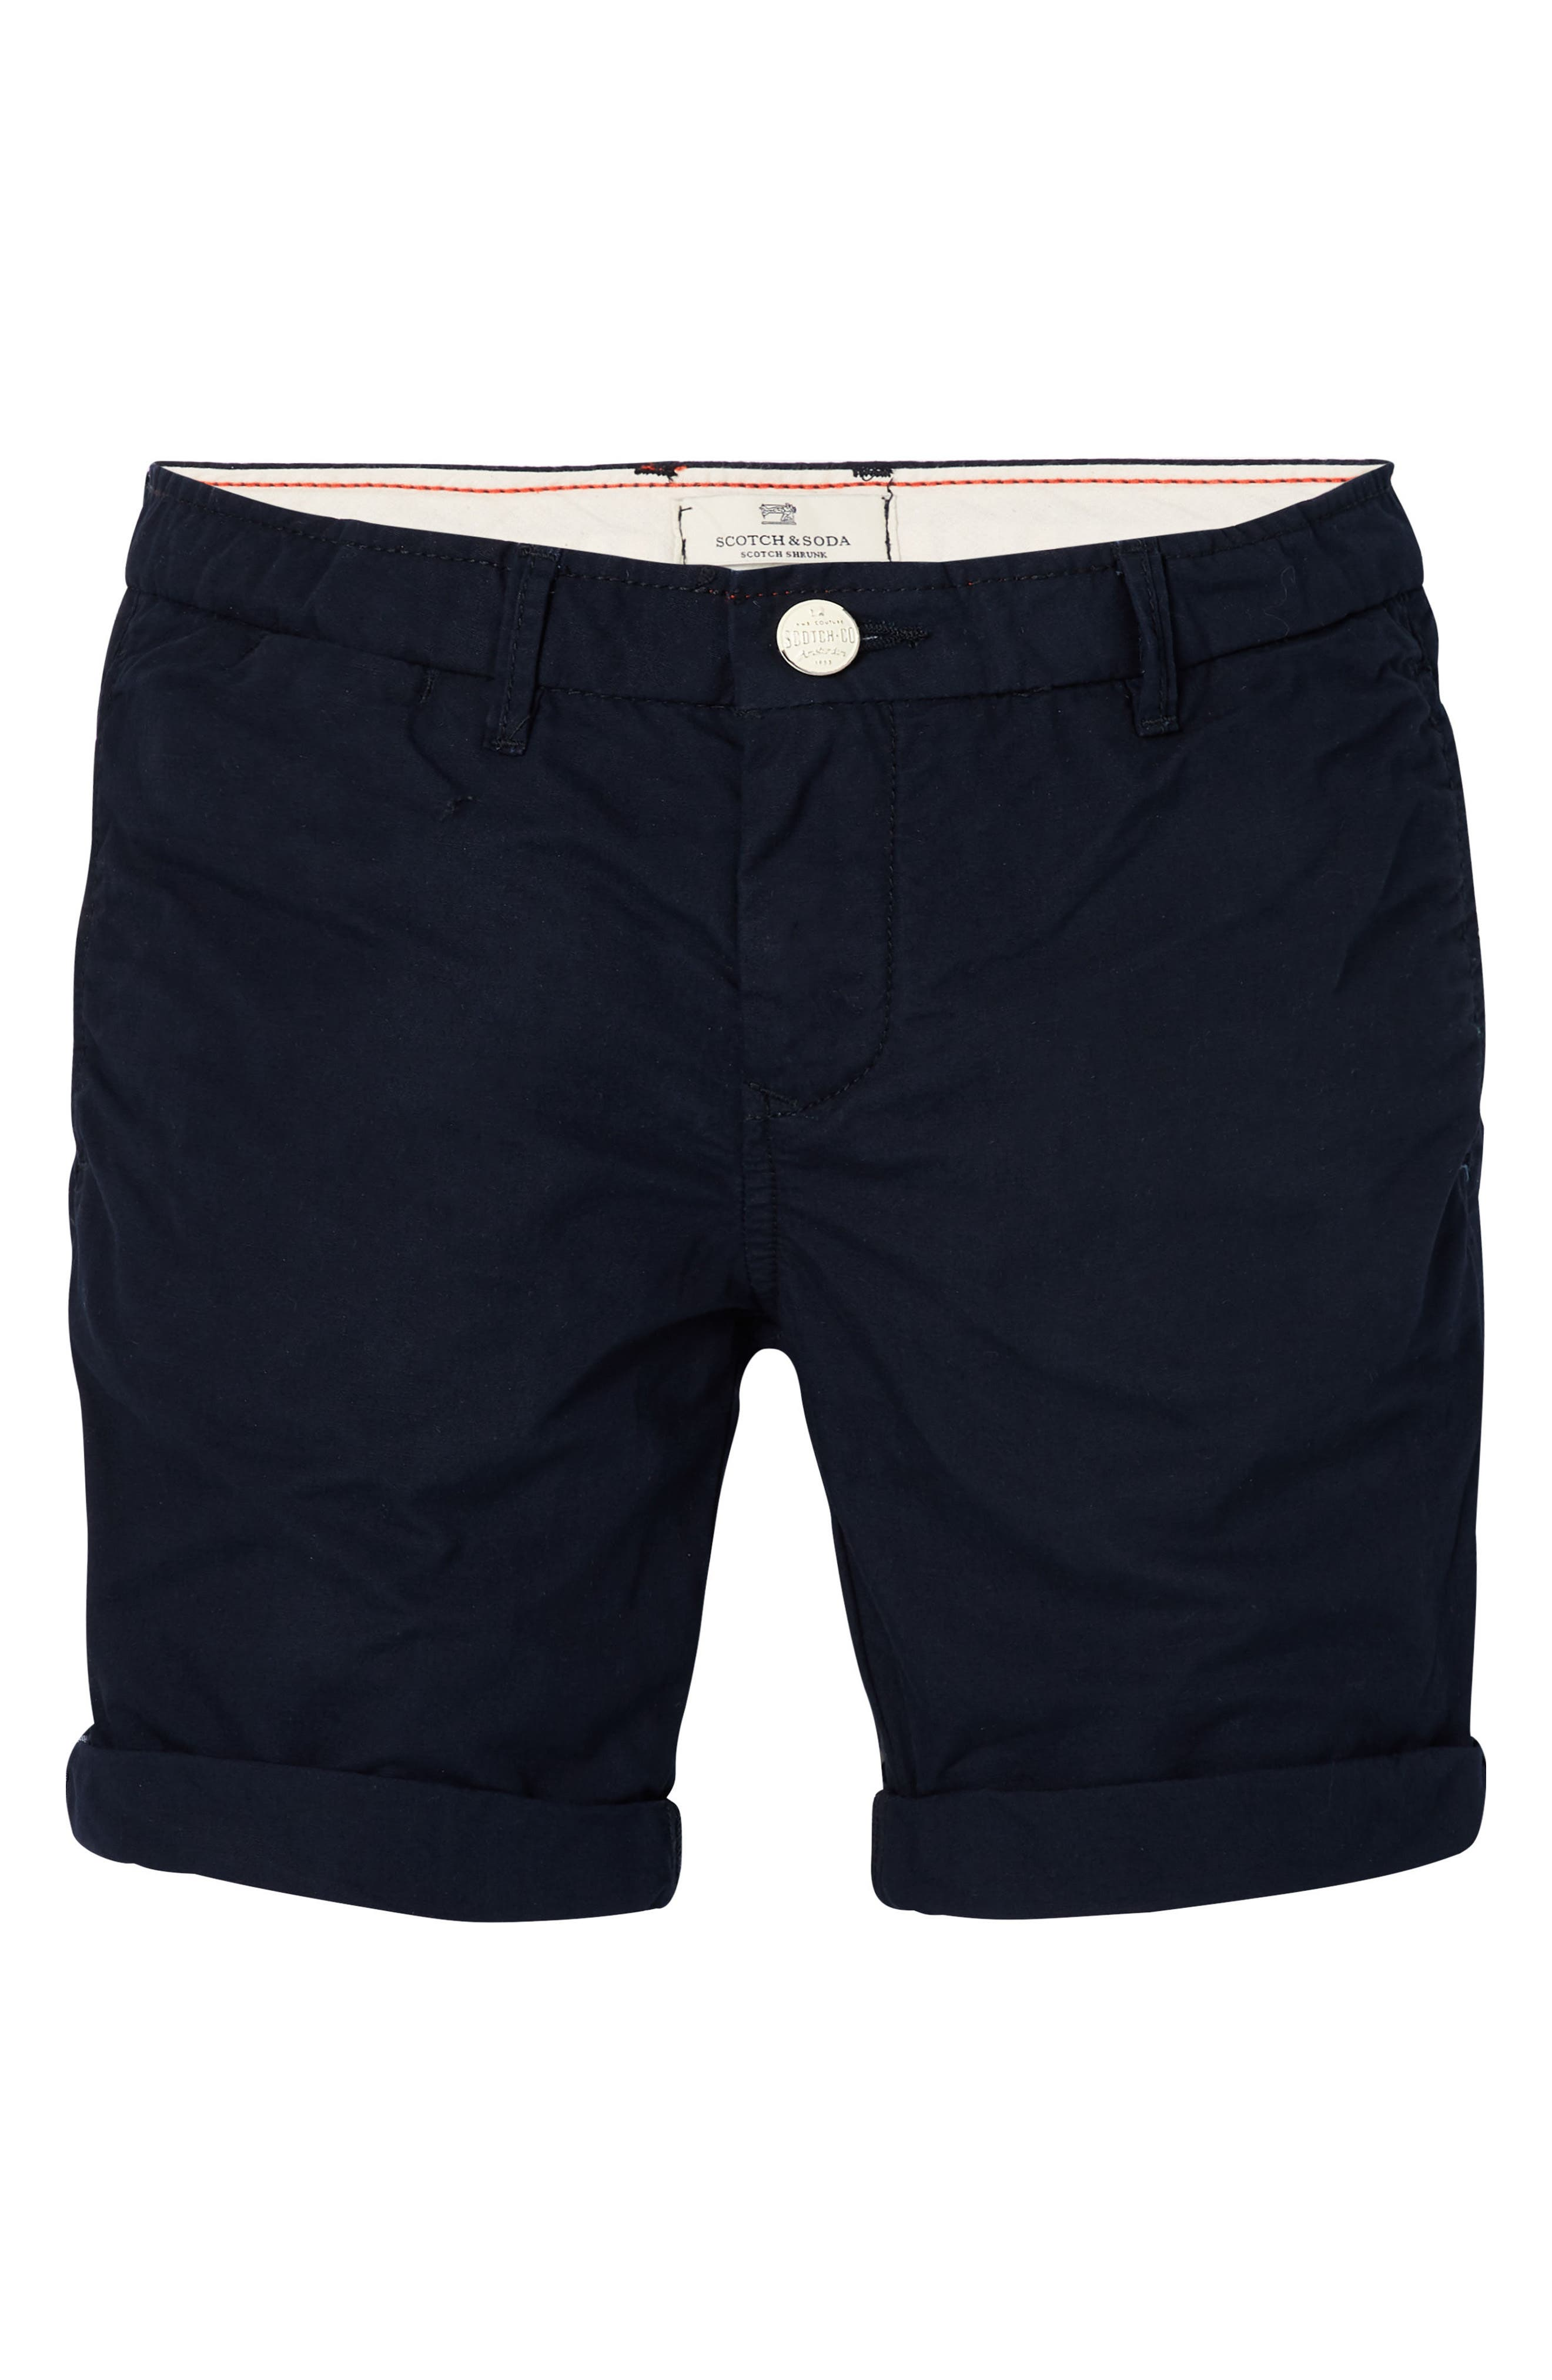 Poplin Shorts,                         Main,                         color, Night